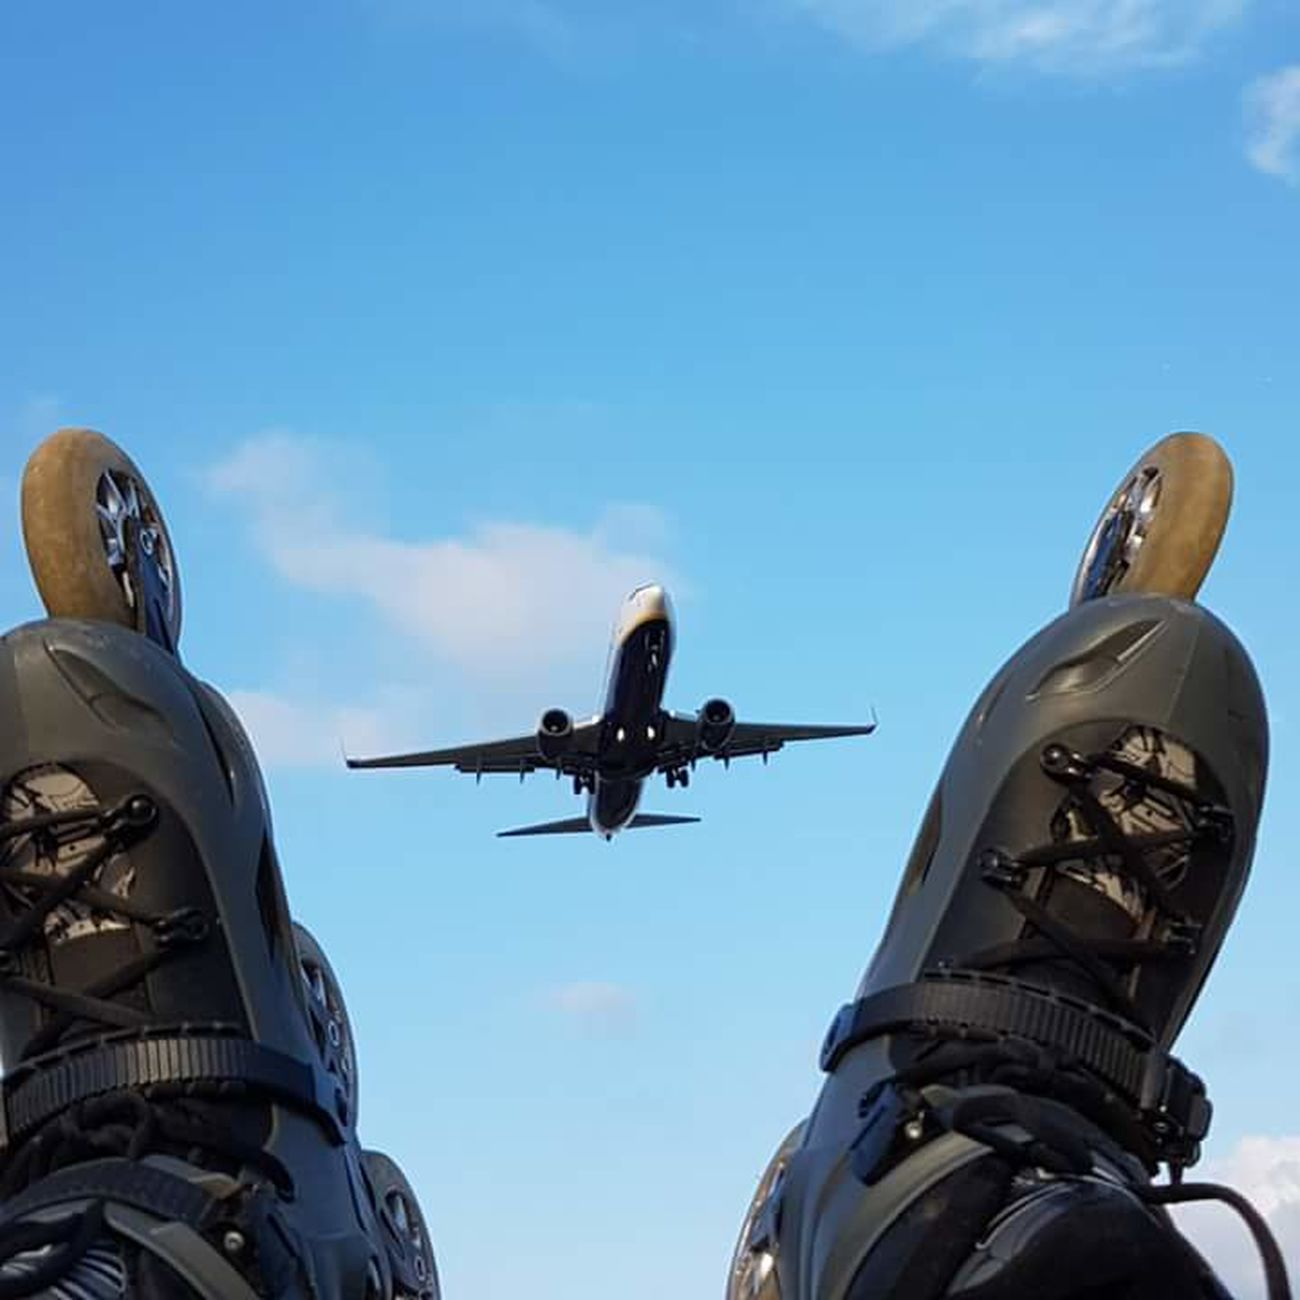 Deporte Avion Patines